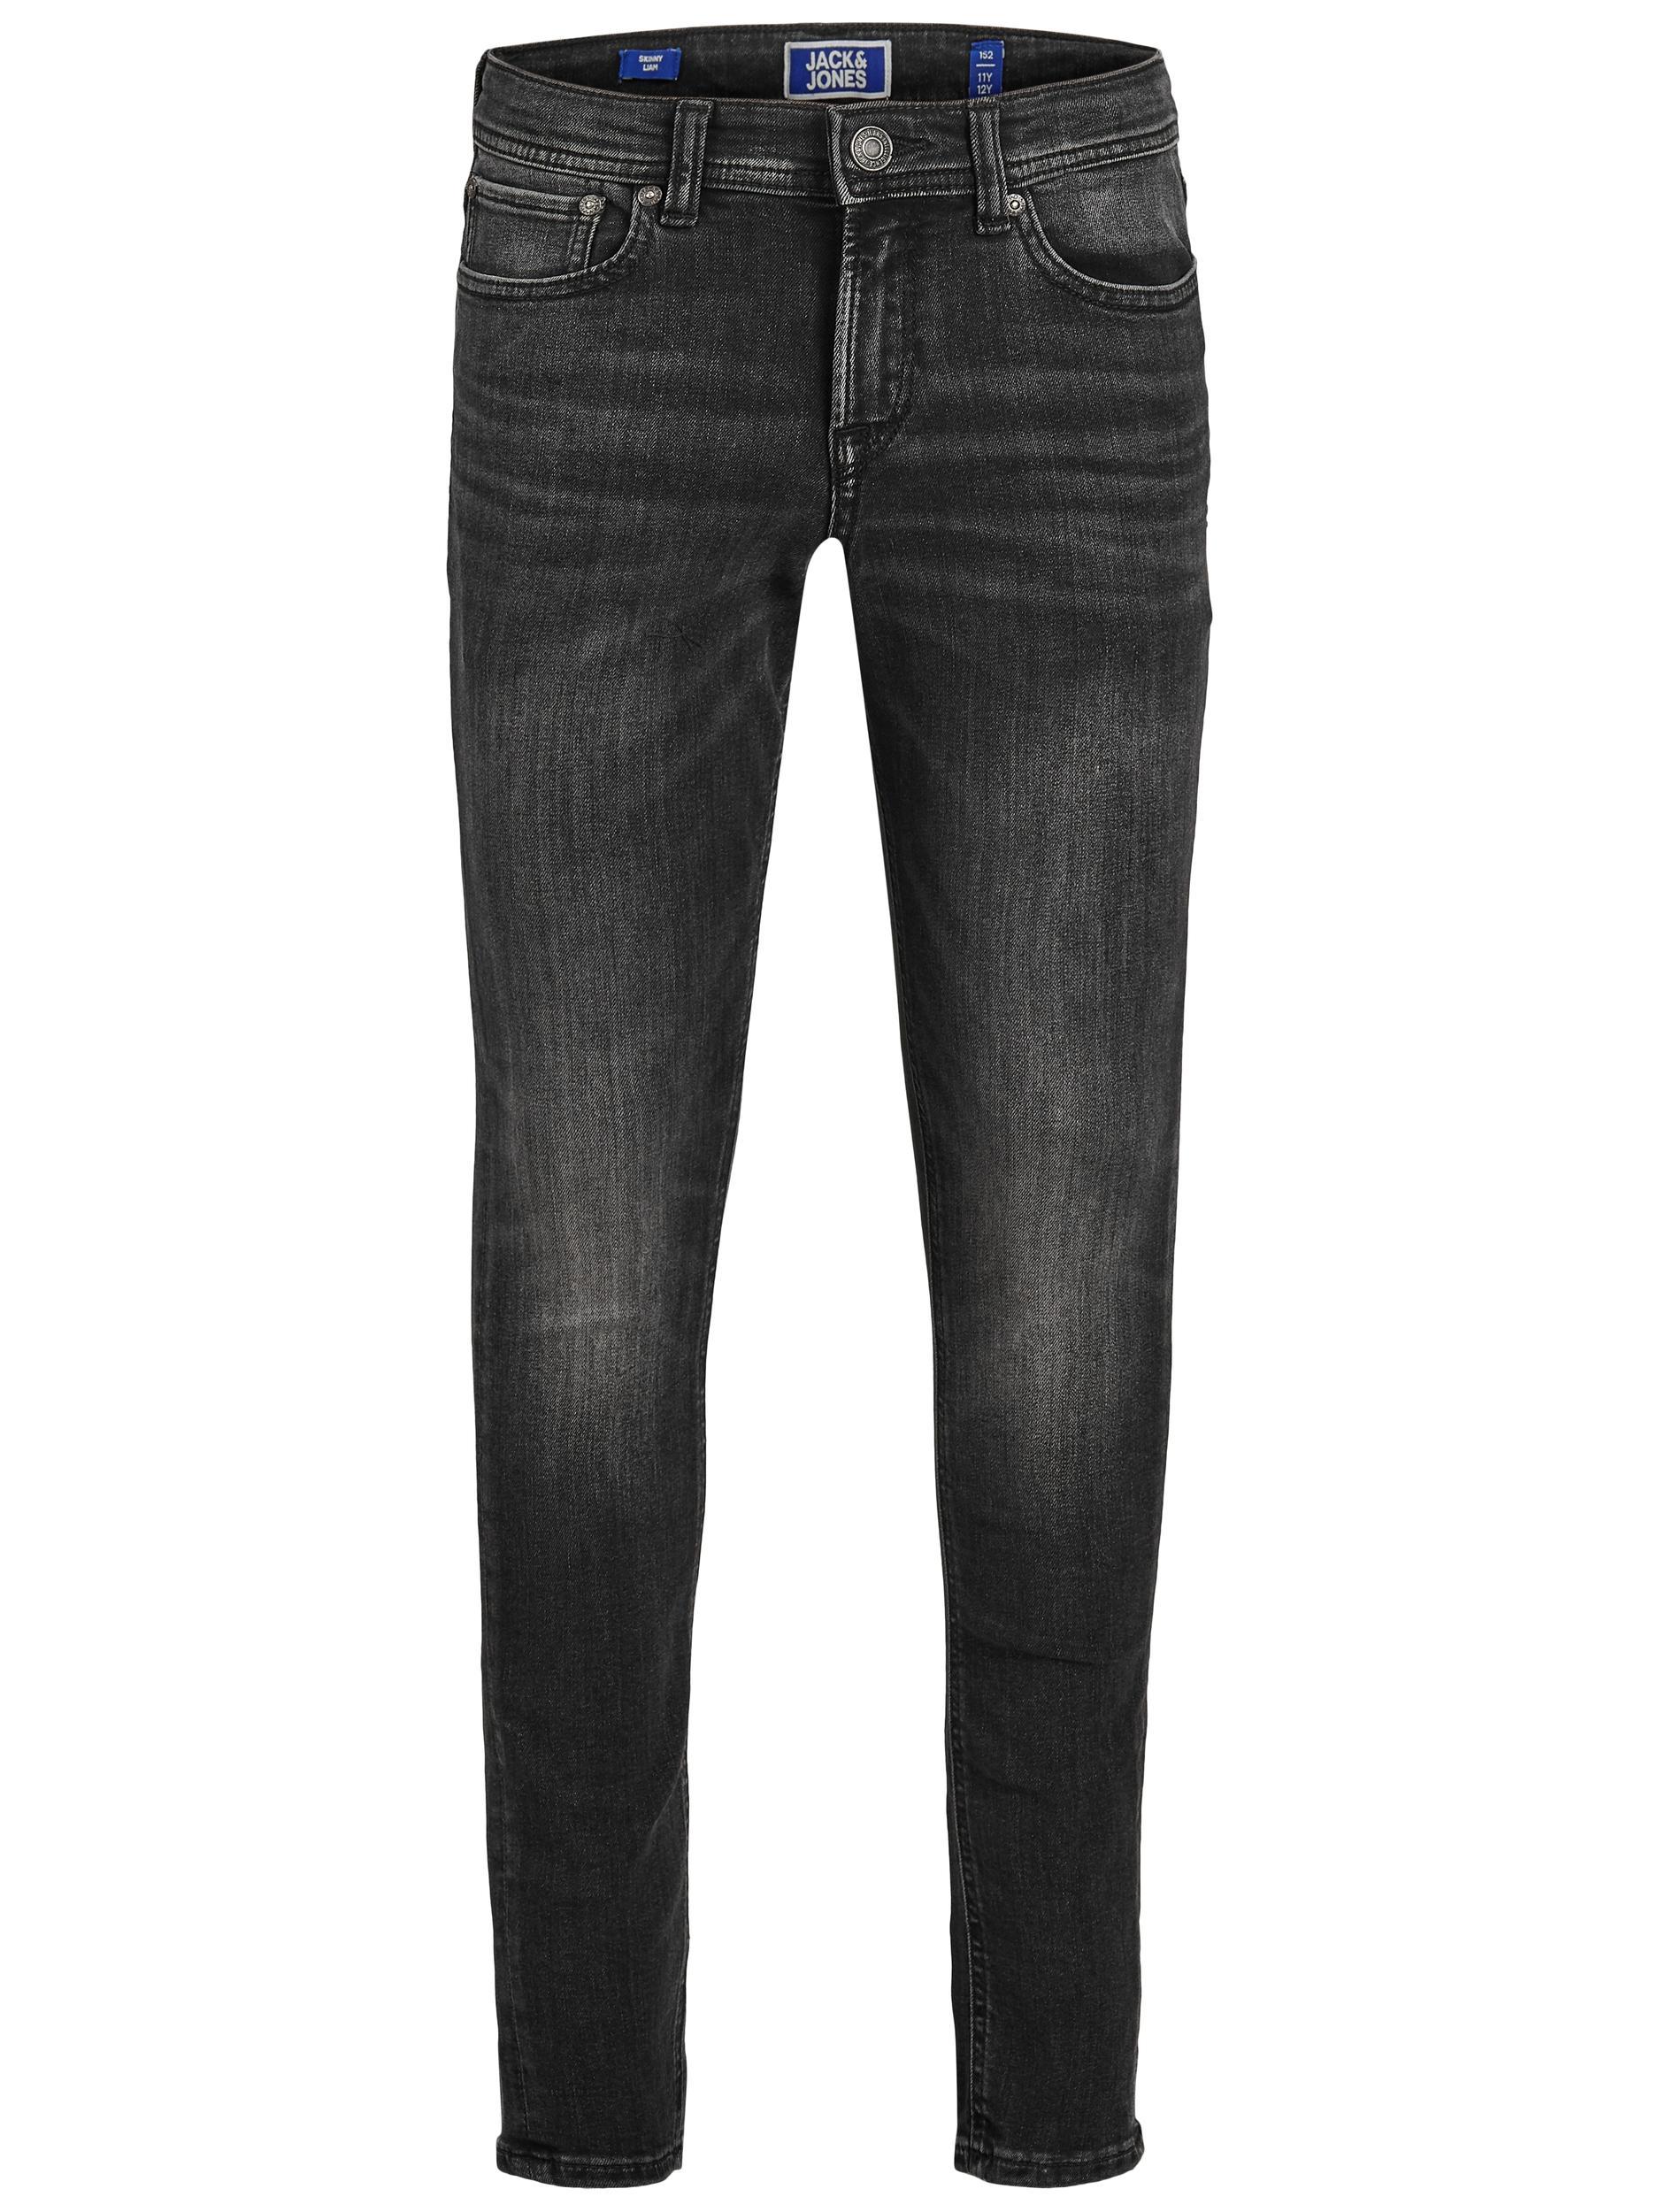 Jack & Jones Liam jeans, black denim, 176